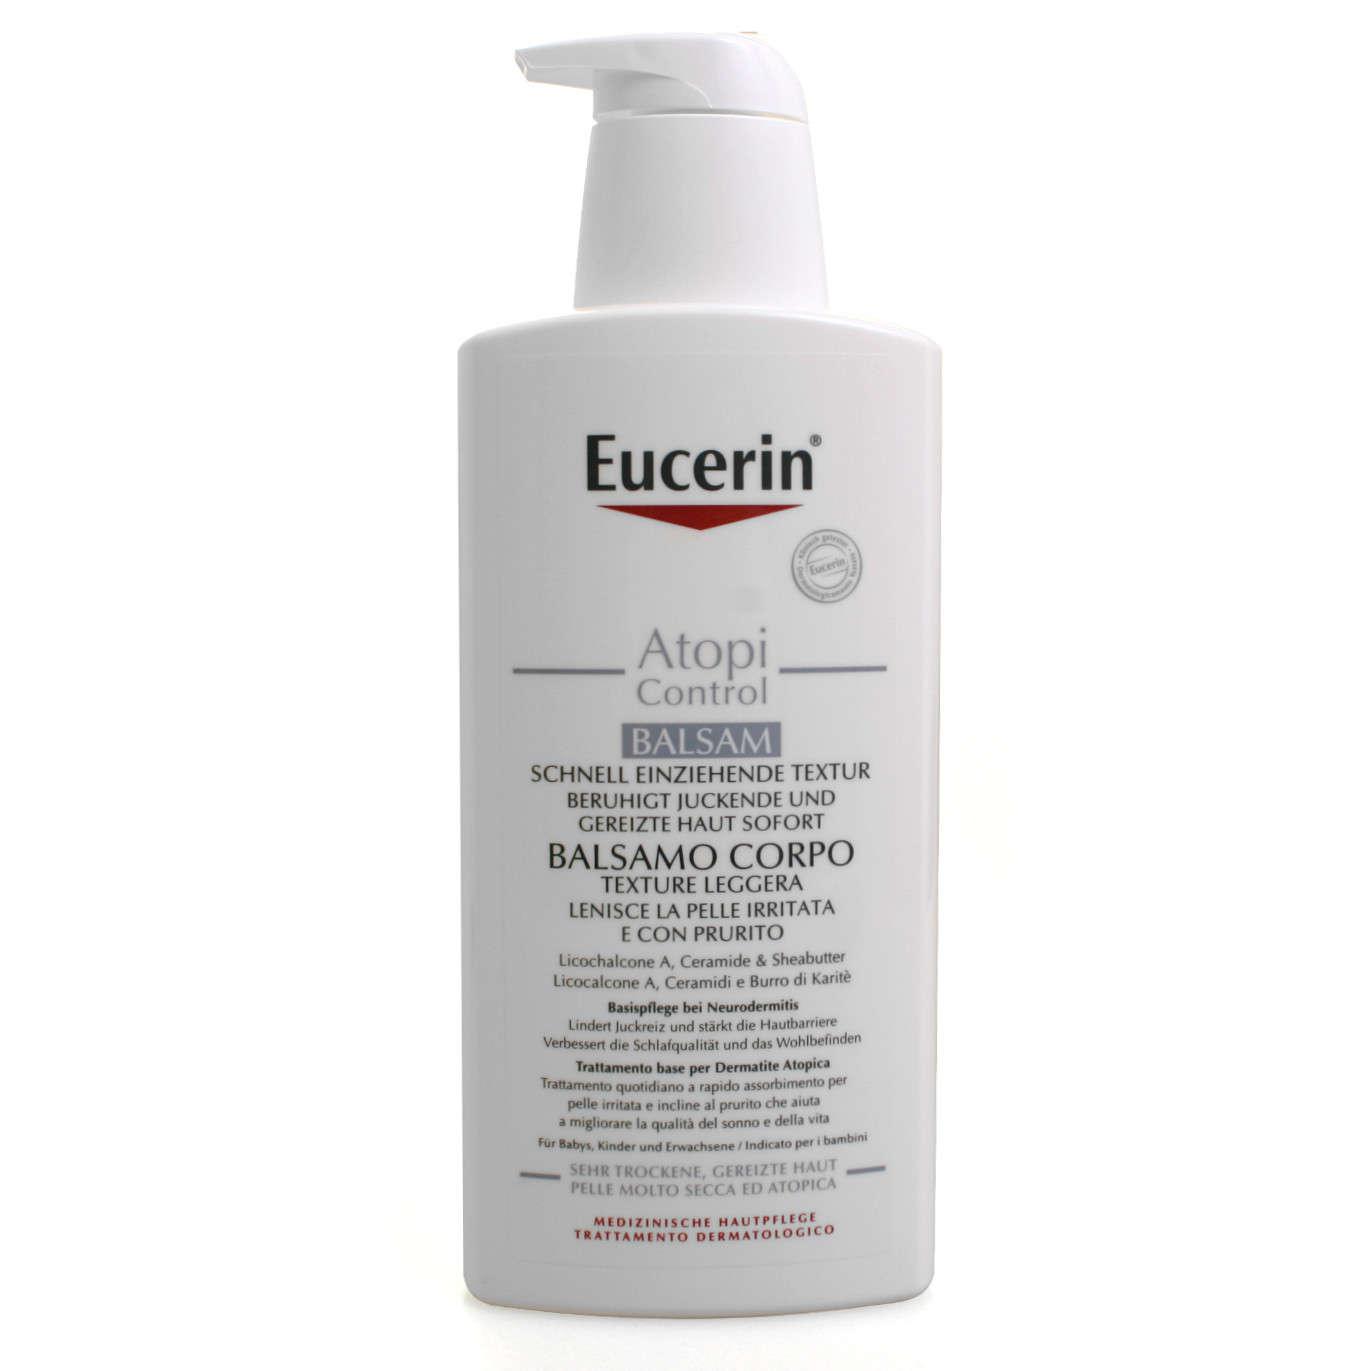 Eucerin - Atopi-control - Balsamo corpo texture leggera